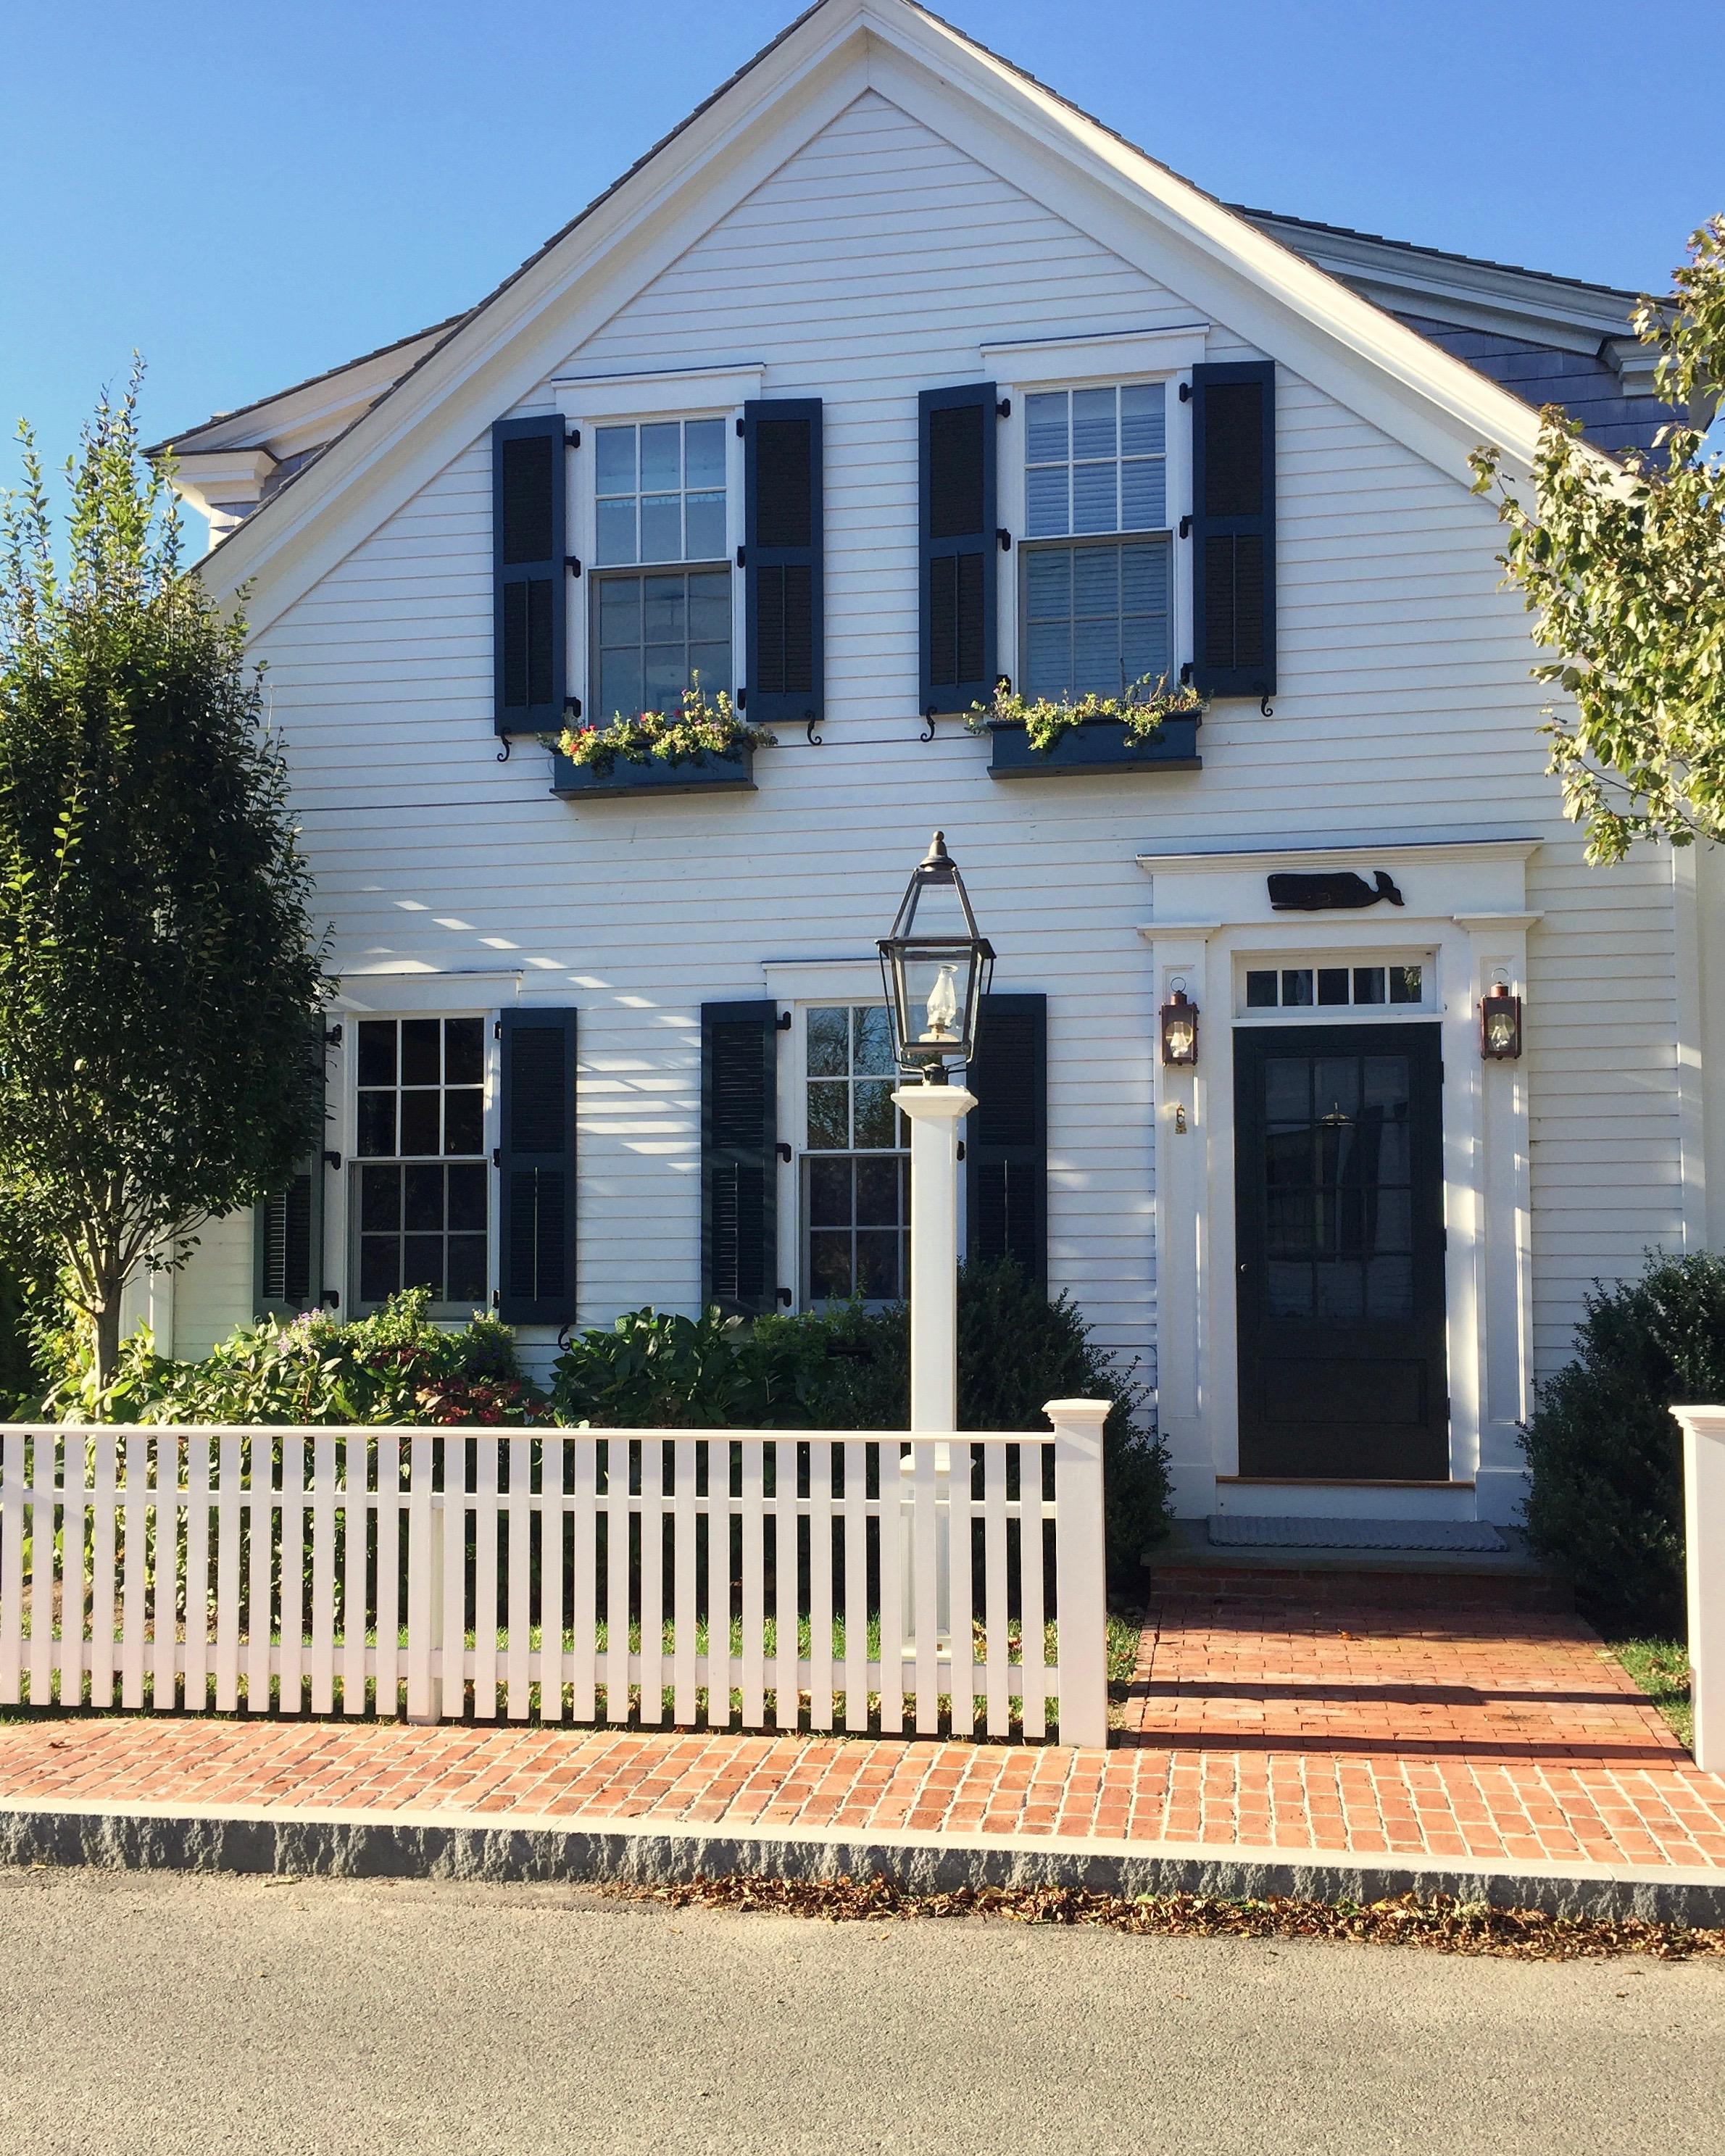 marthas vineyard new england massachusetts  white antique home  green shutters green door whale sign.jpg